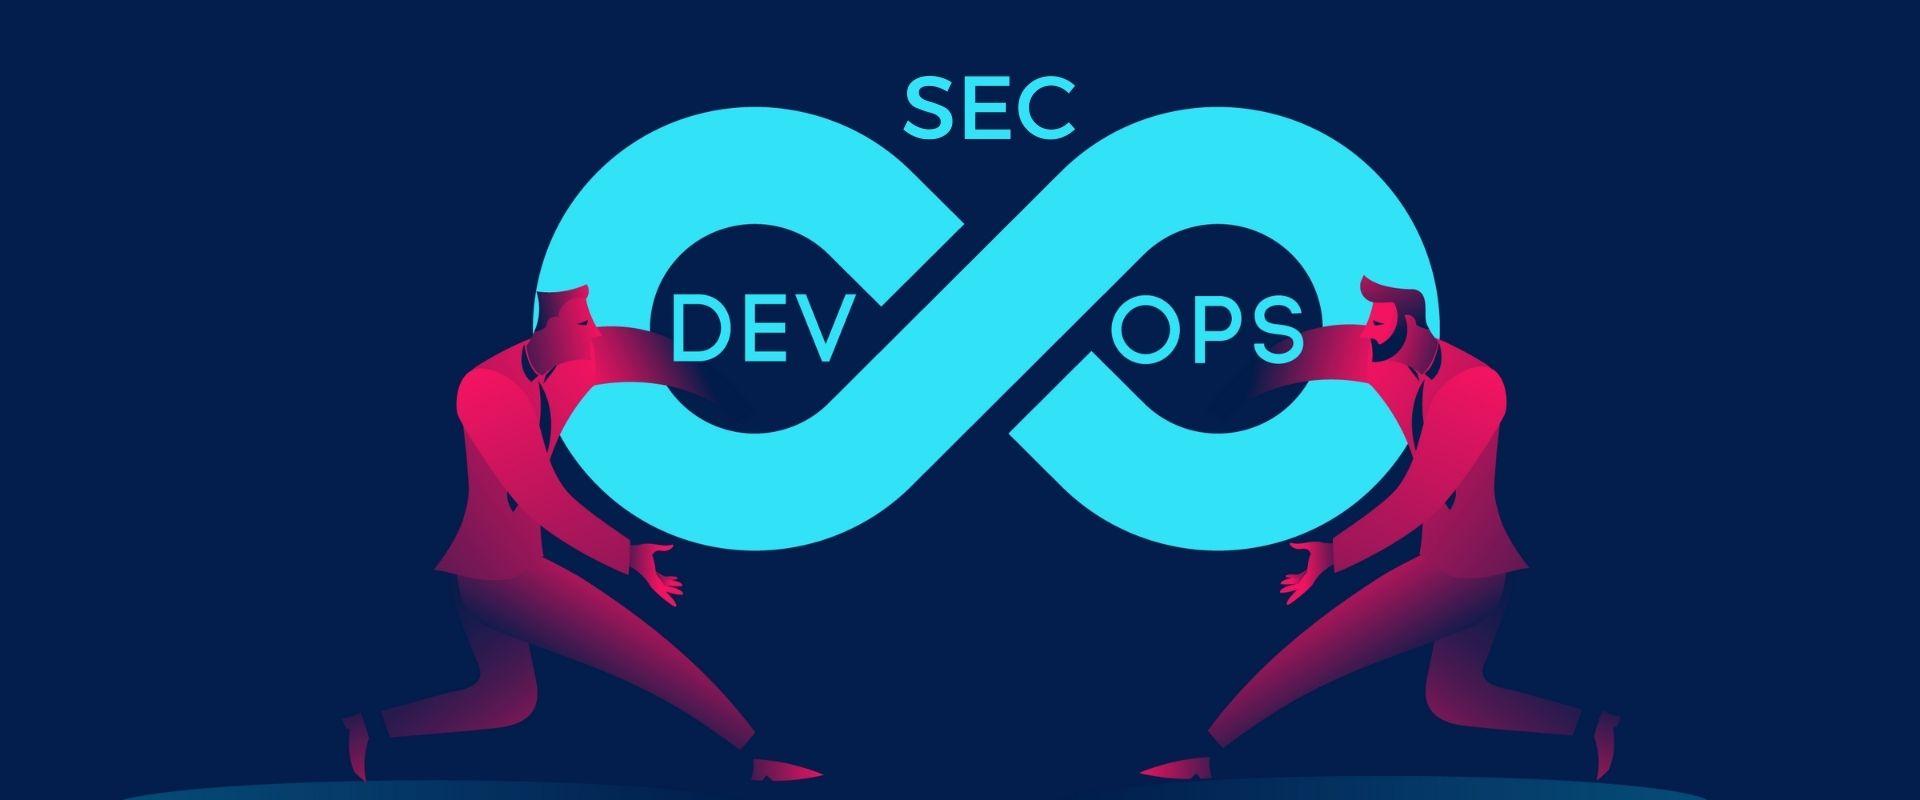 Qual é a diferença entre DevOps e DevSecOps?